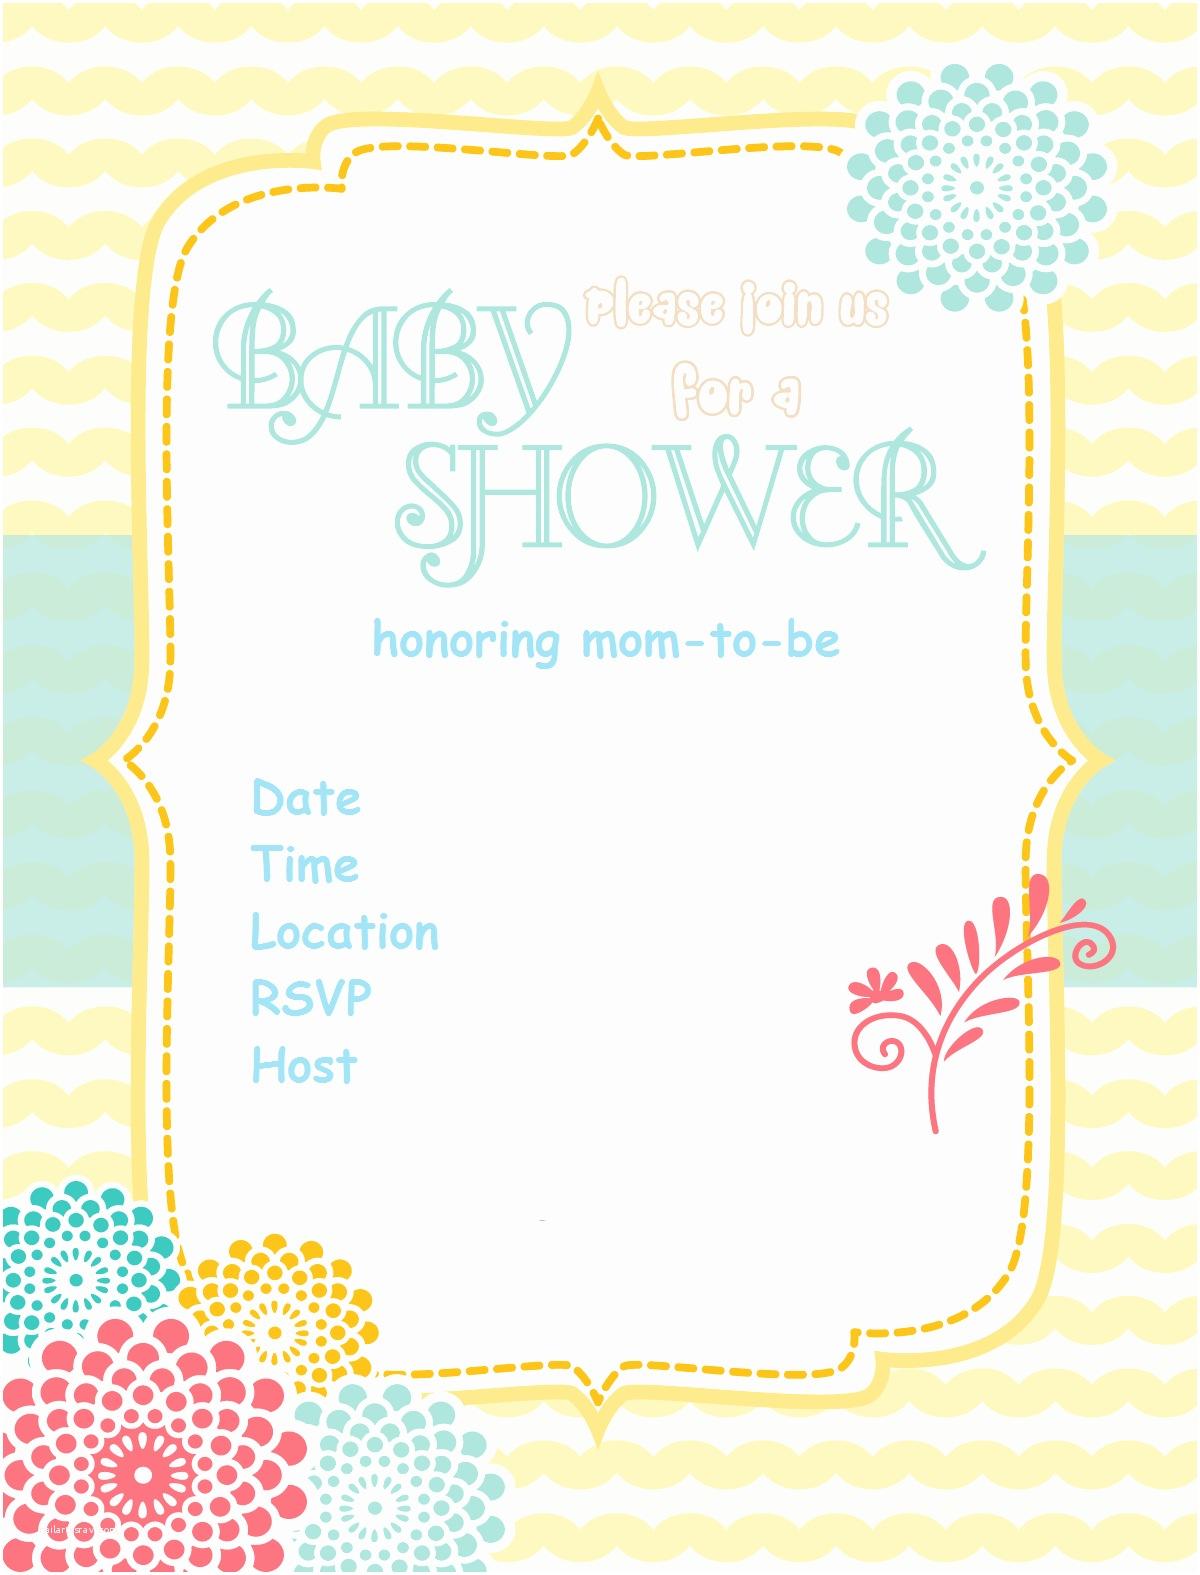 Gender Neutral Baby Shower Invitations Template Gender Neutral Baby Shower Invitation Wording